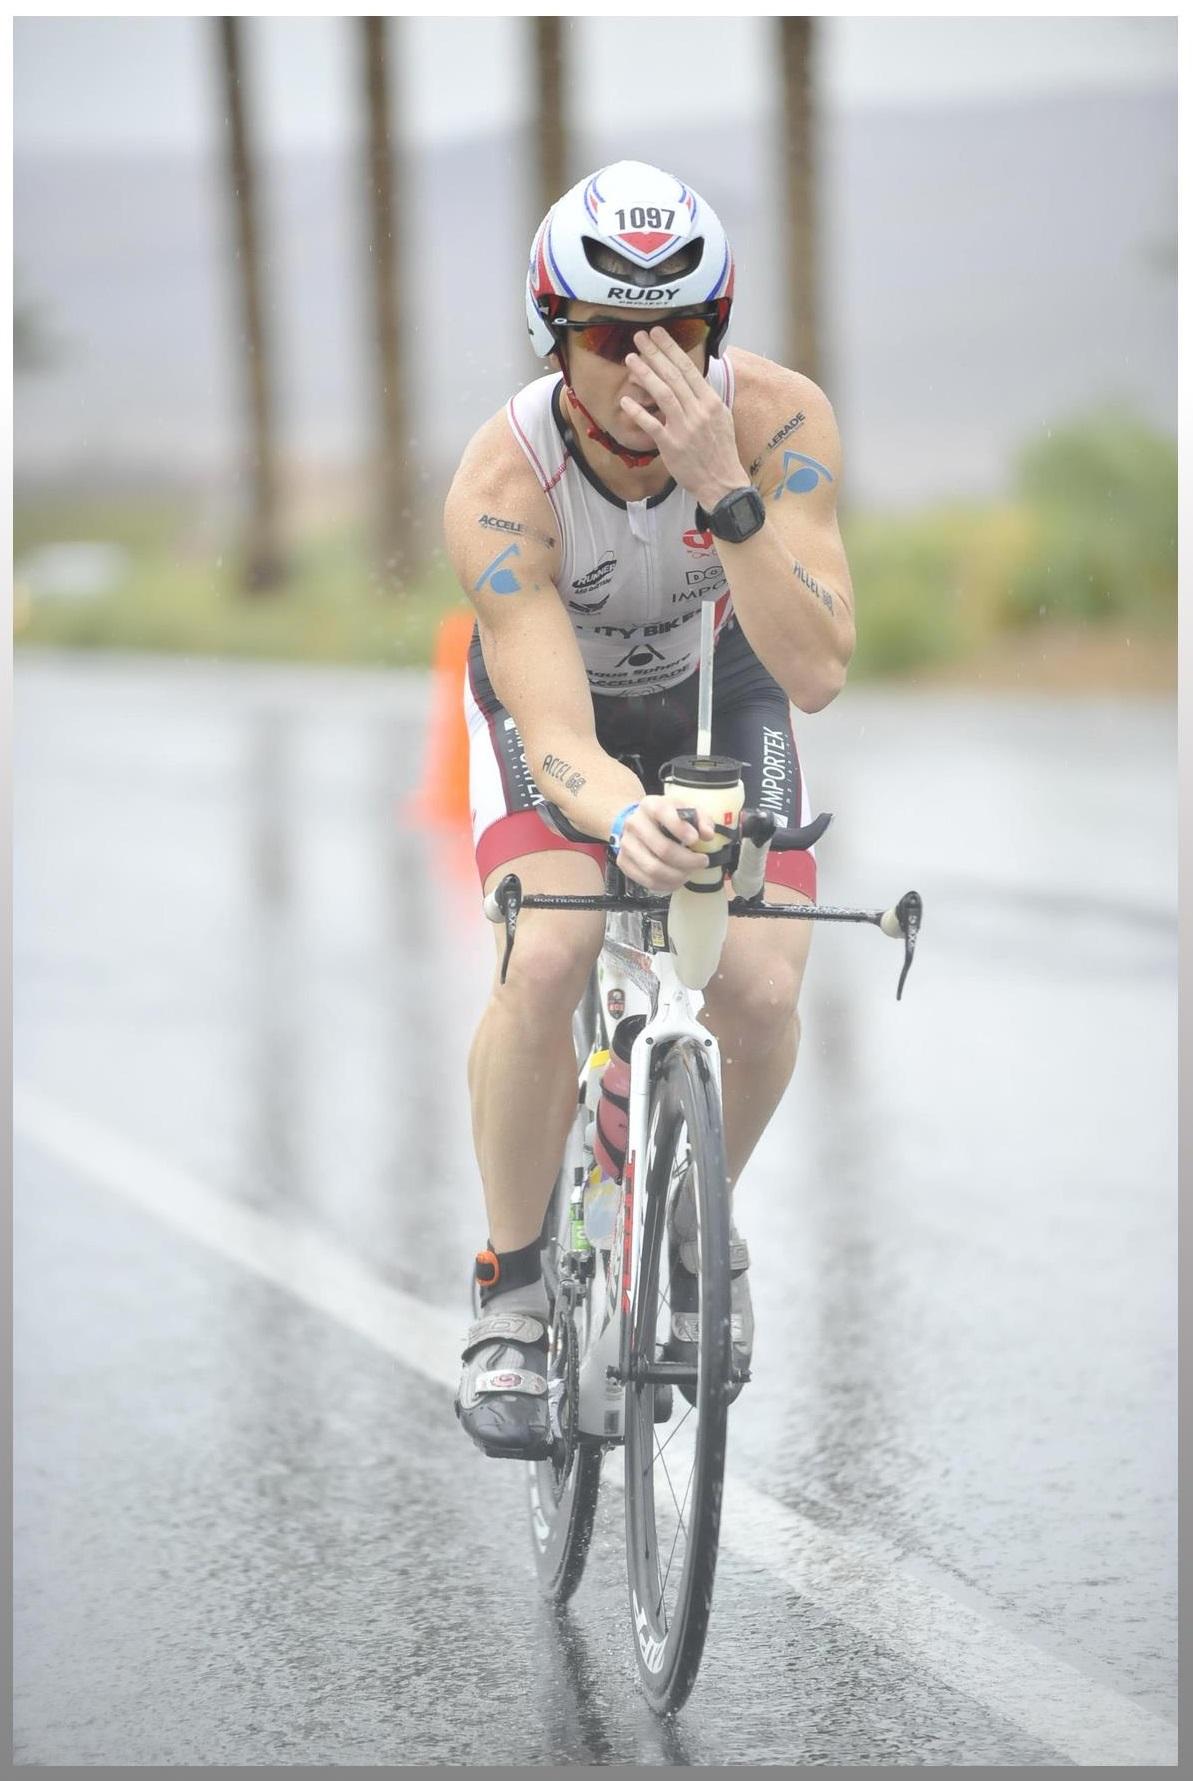 Flavio jose no Ciclismo  do Mundial Ironman 70.3 Vegas 2013